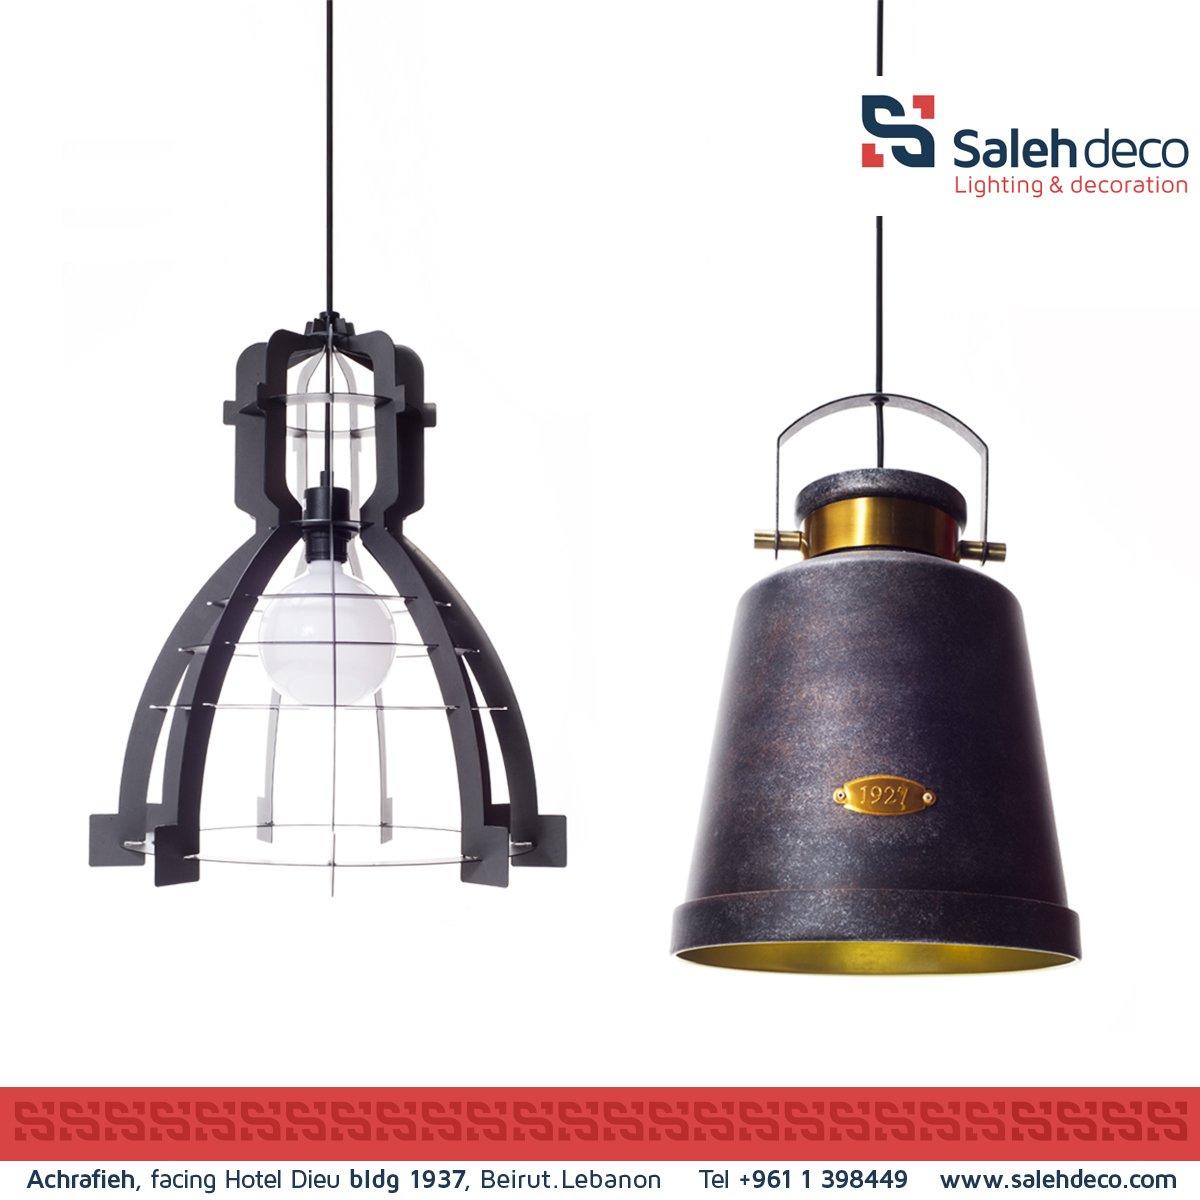 #vintage #Industrial #pendants available now at our showroom. #lighting #interior #design #decor #lebanon #salehdeco https://t.co/U9LrhYYJur